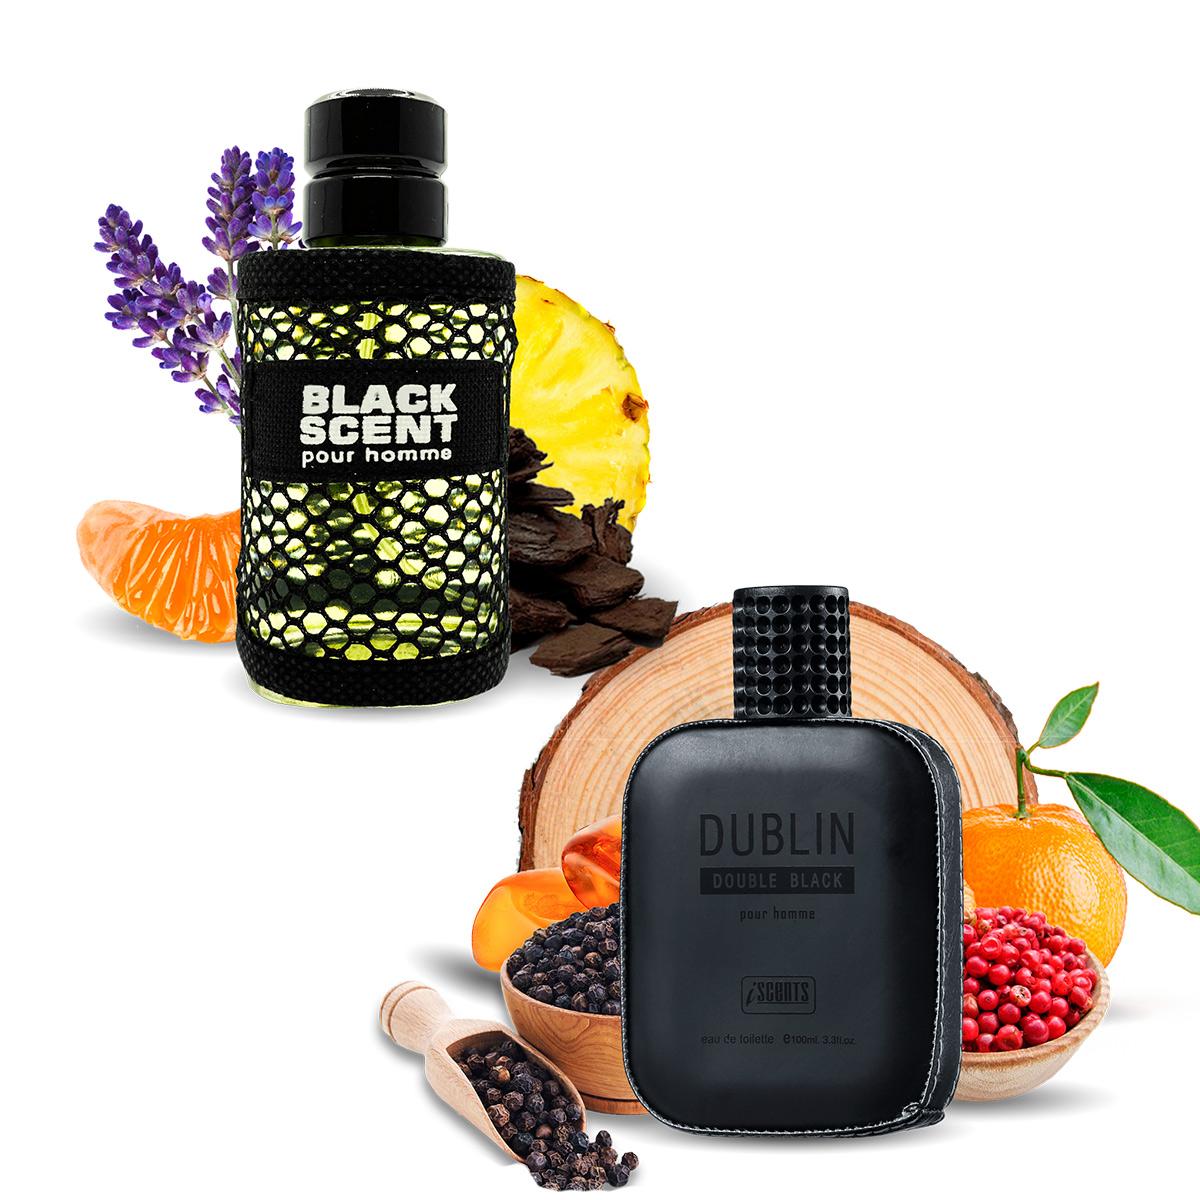 Kit 2 Perfumes Importados Black Scent e Dublin I Scents